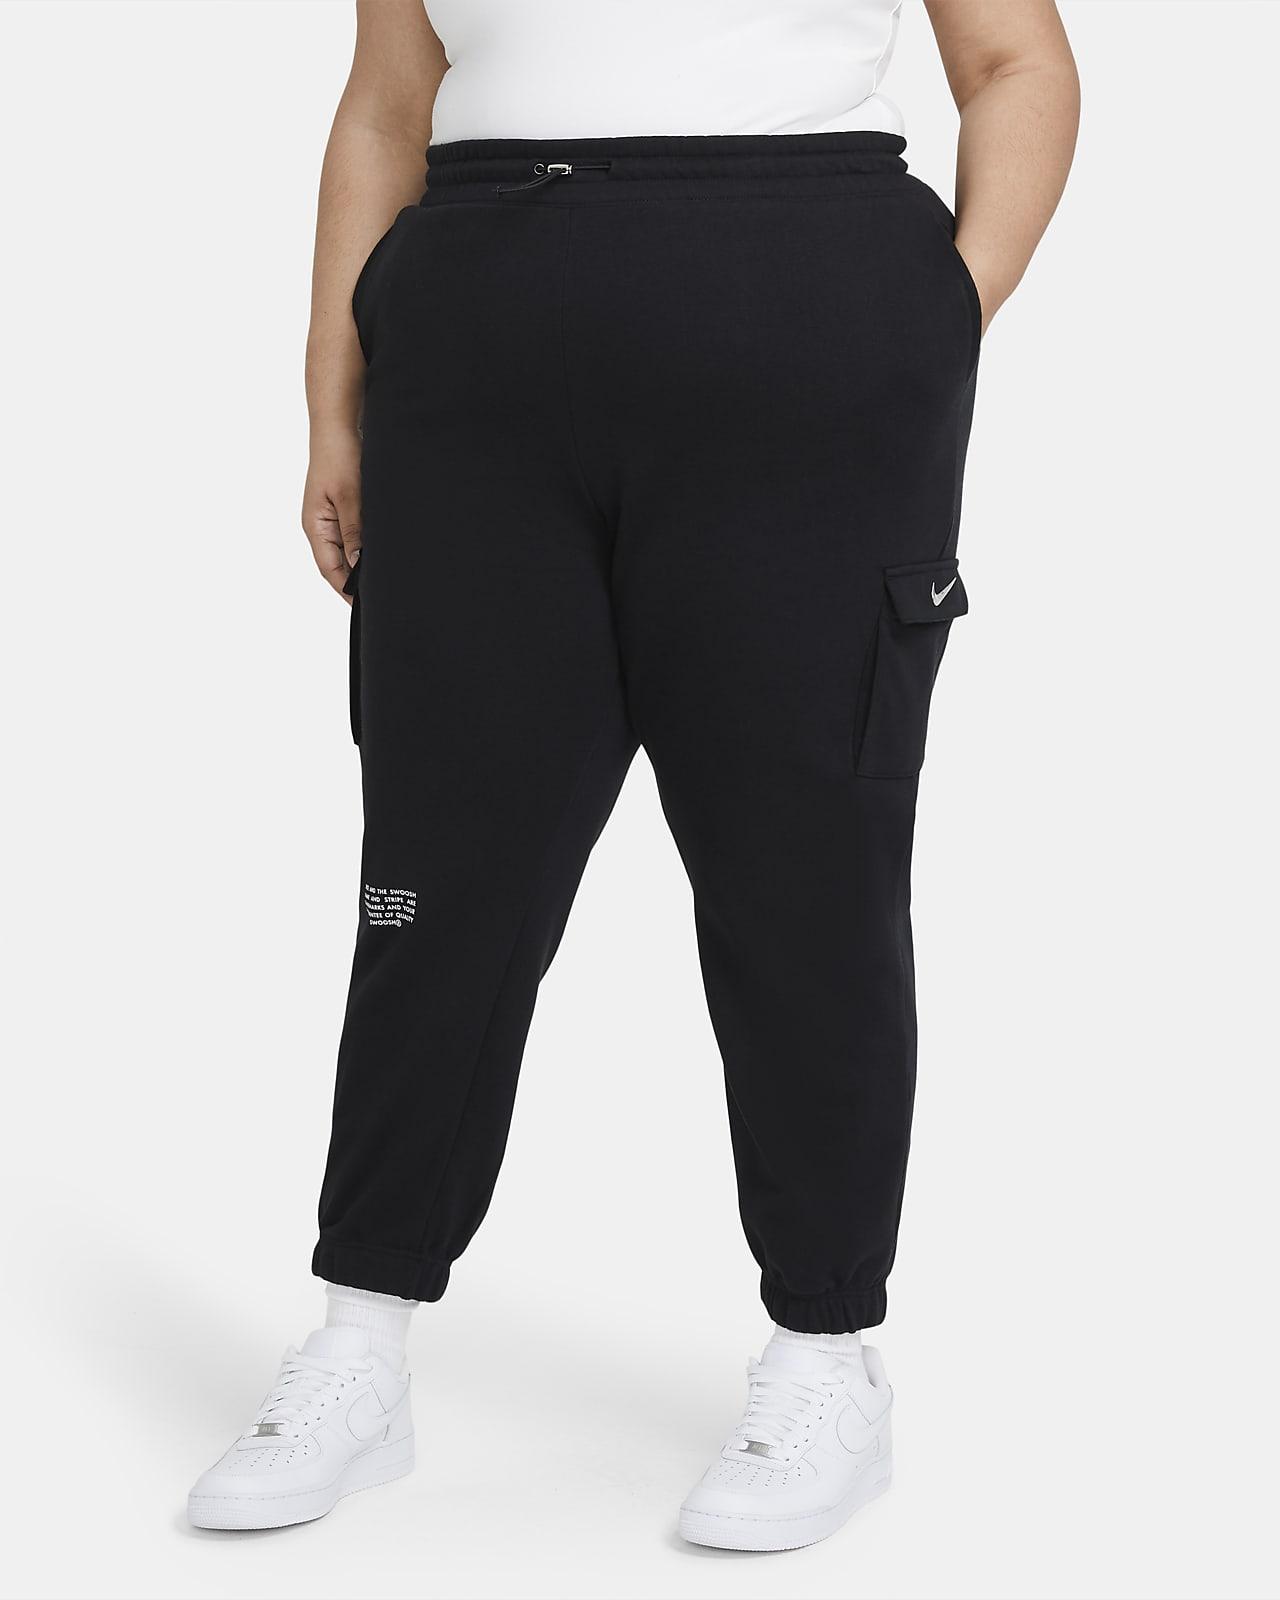 Pantaloni Nike Sportswear Swoosh (Plus size) - Donna